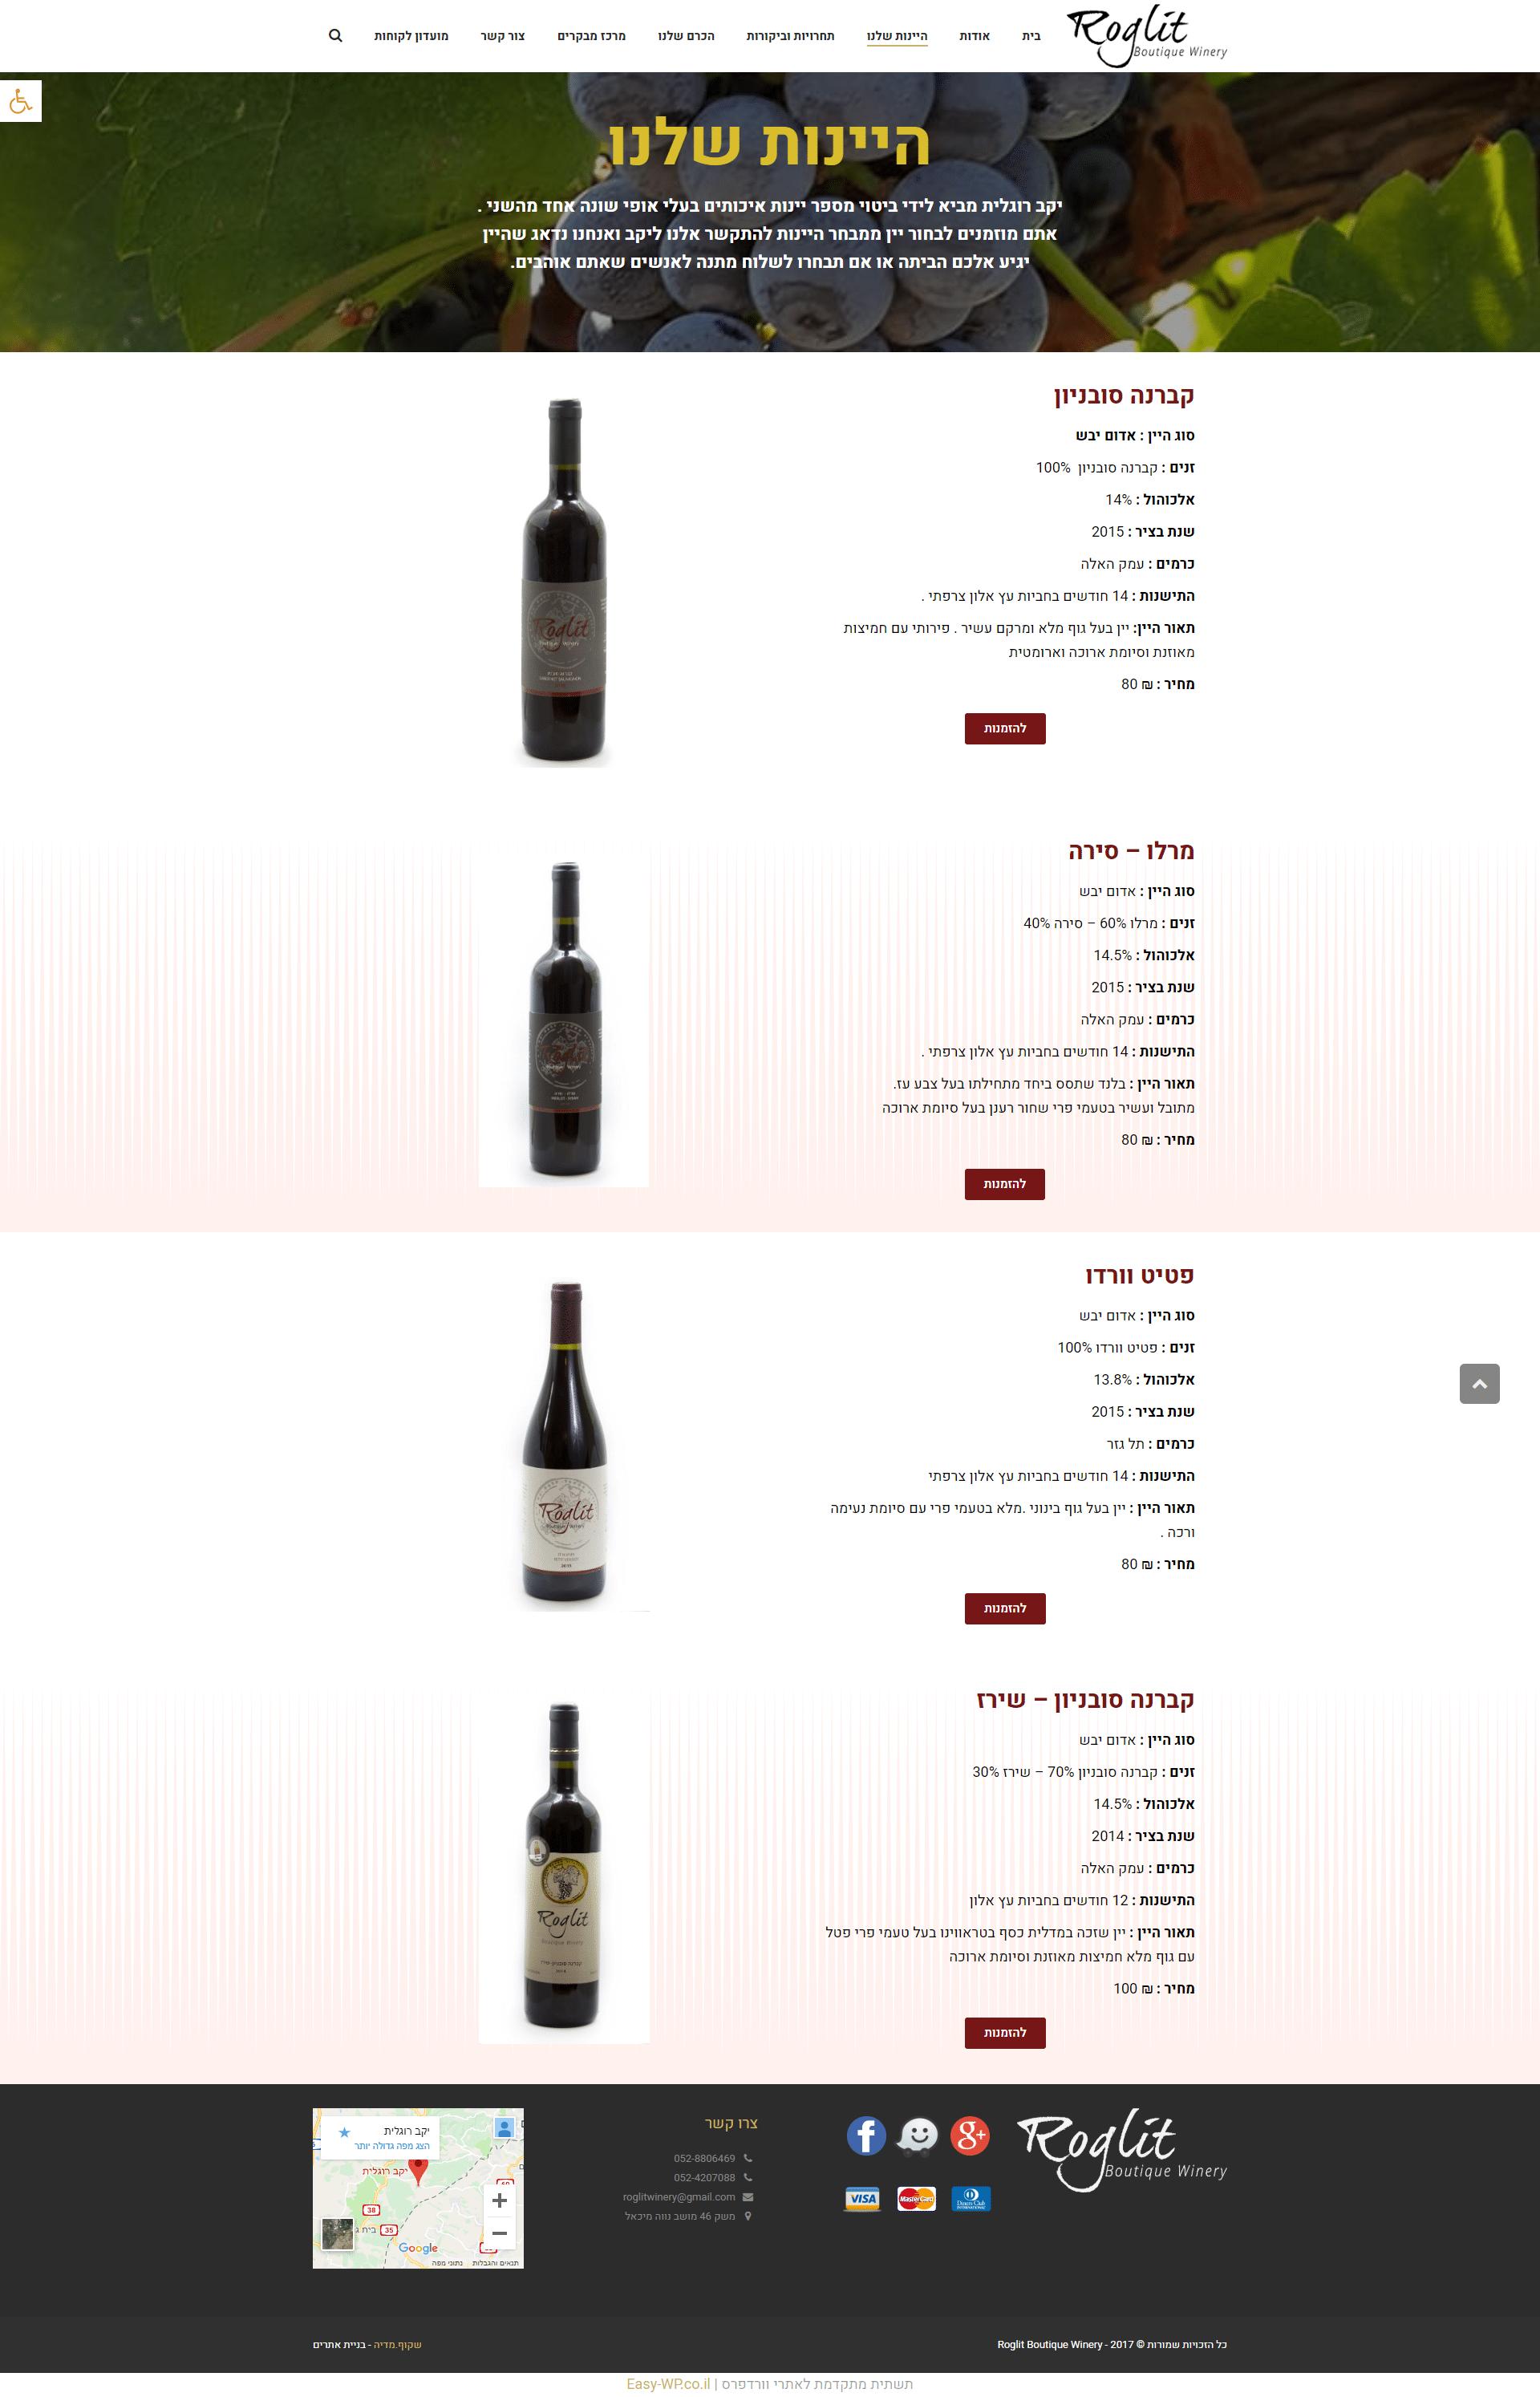 3roglit-winery.co.il